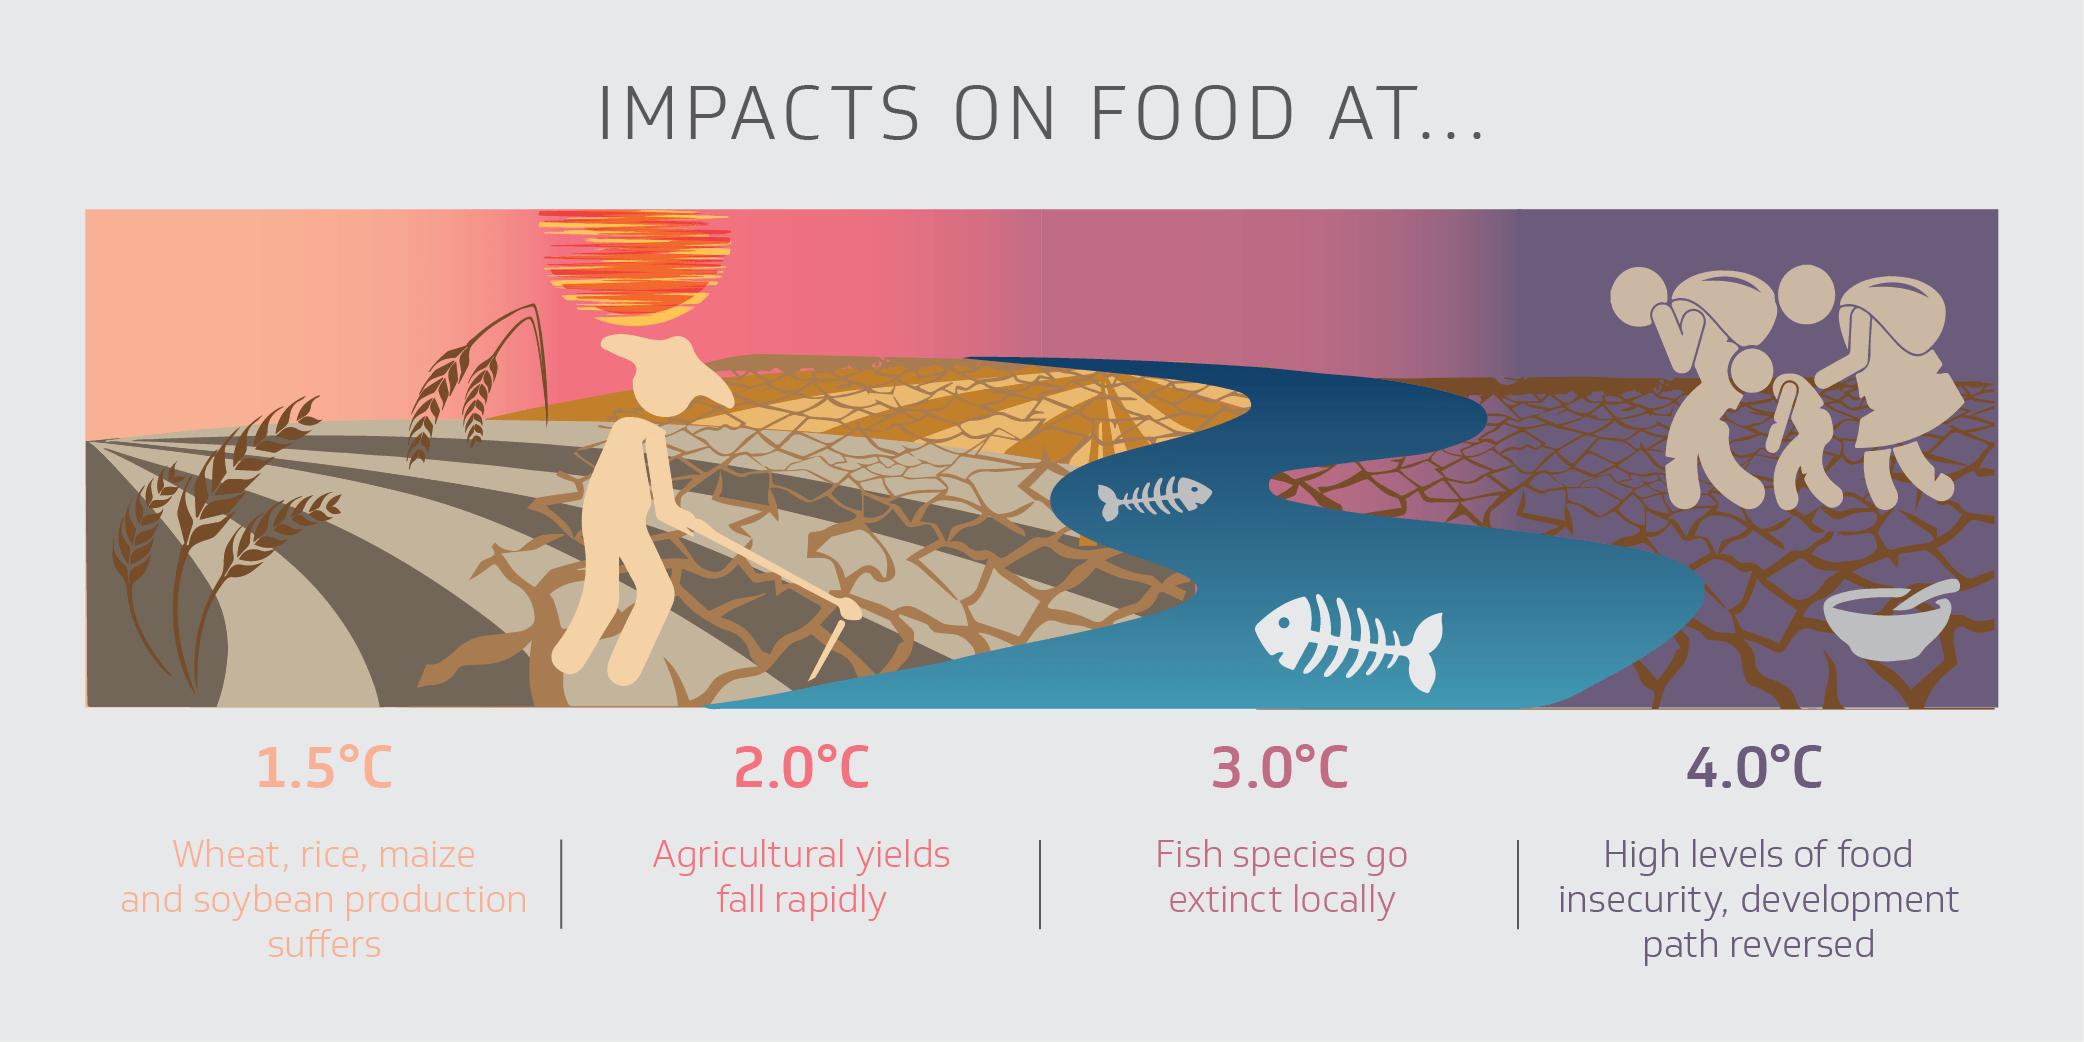 Comparing climate impacts at 1.5°C, 2°C, 3°C and 4°C